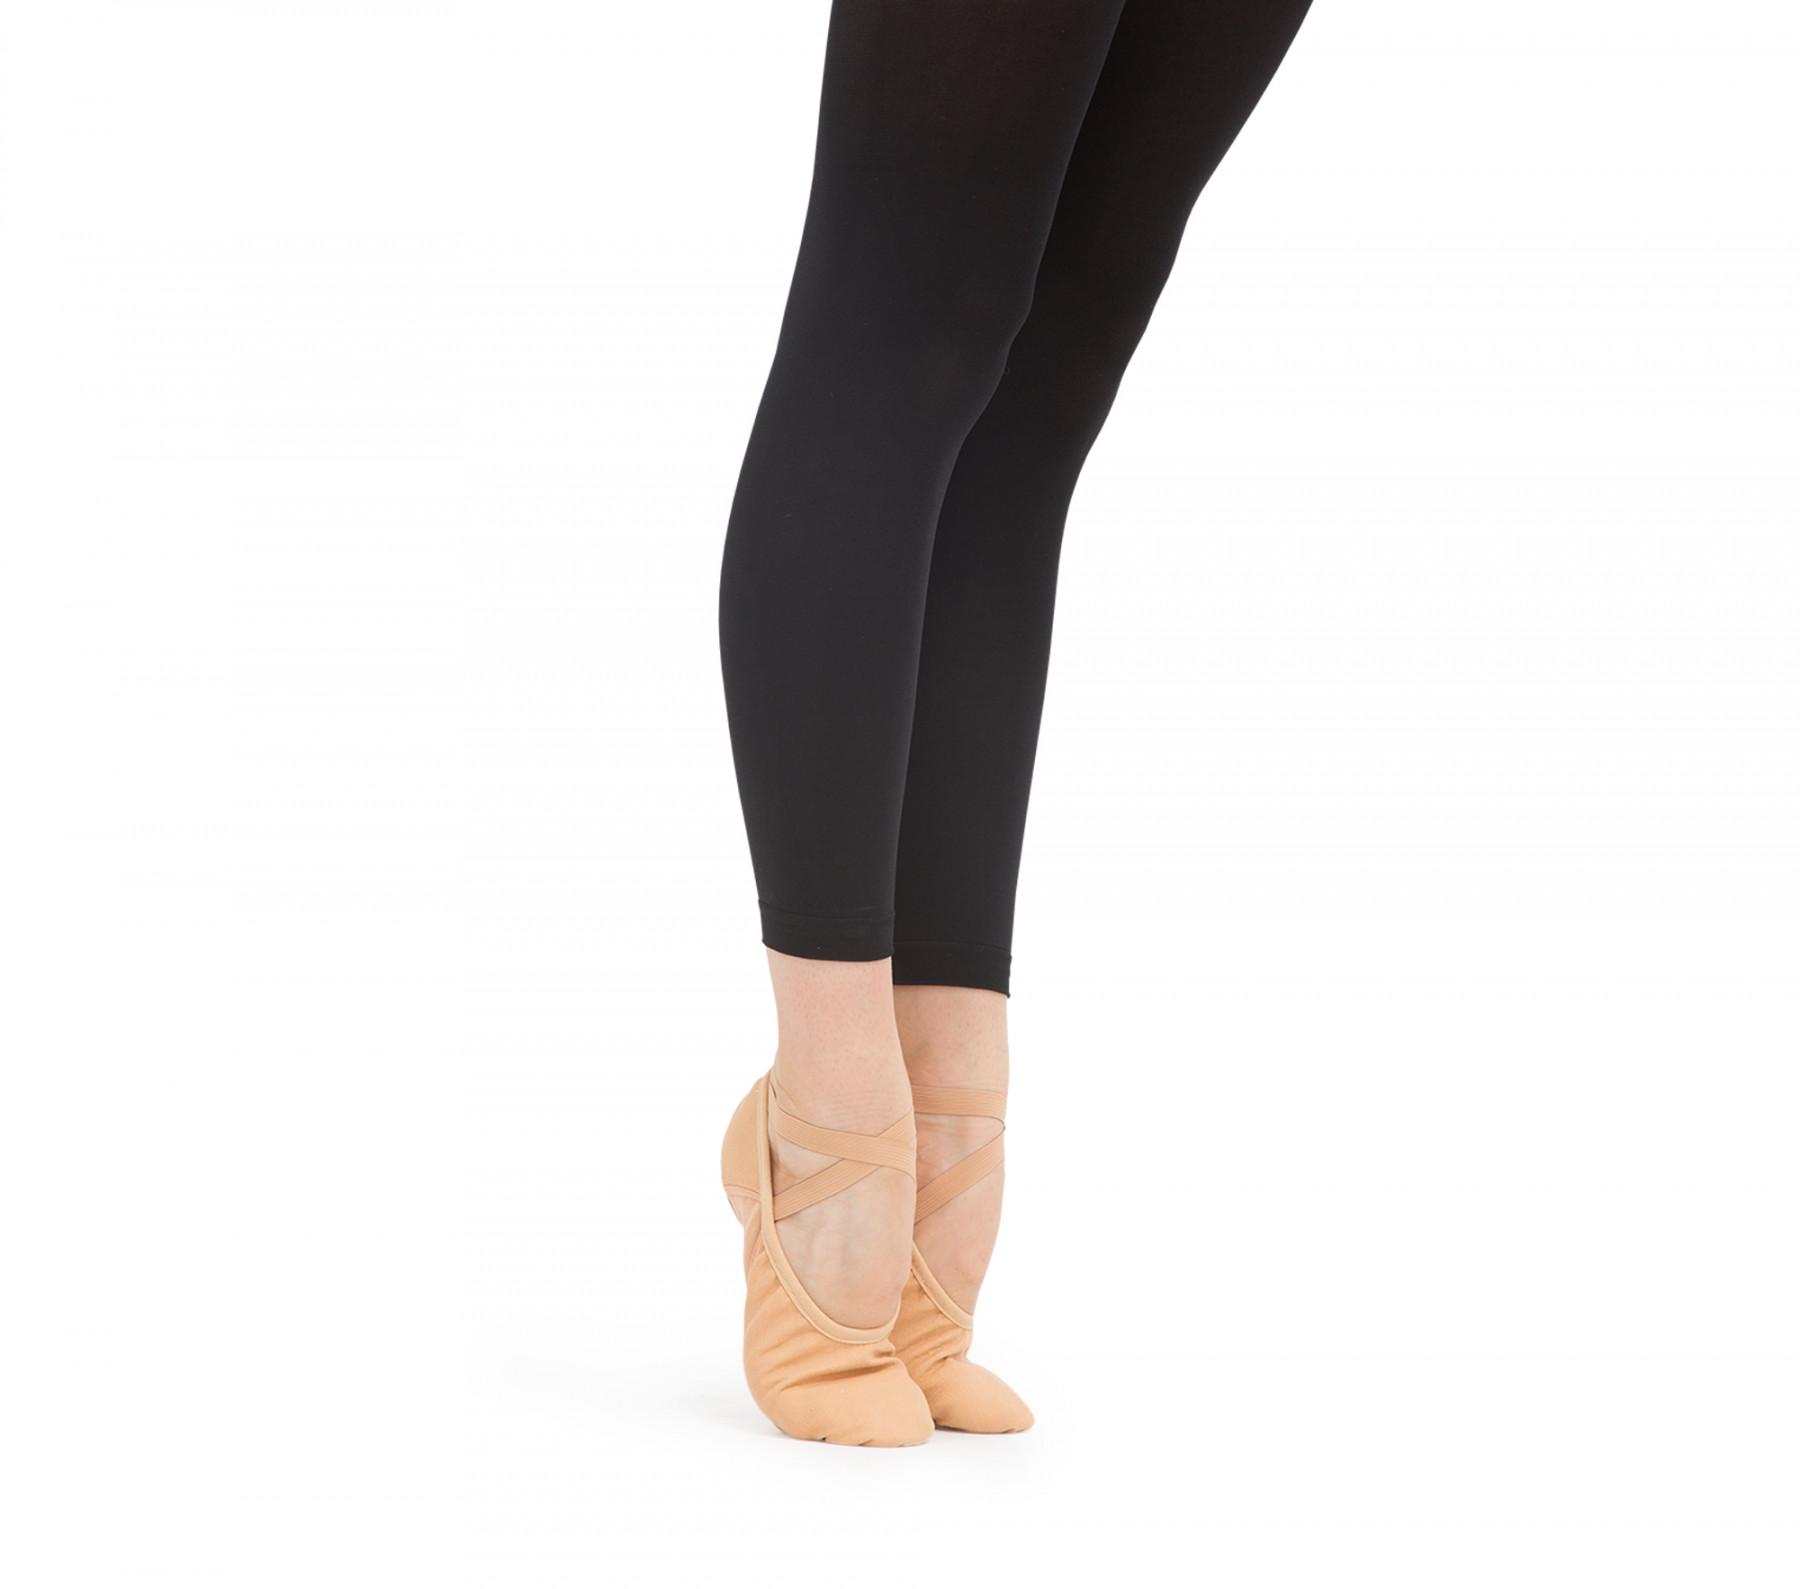 Professional soft ballet shoes with split sole (medium width